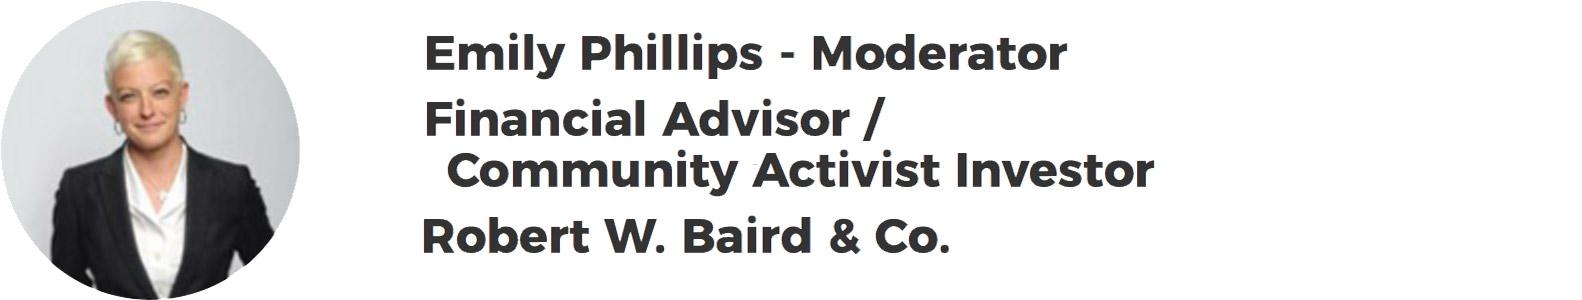 Emily Phillips – Financial Advisor / Community Activist Investor – Robert W. Baird & Co.